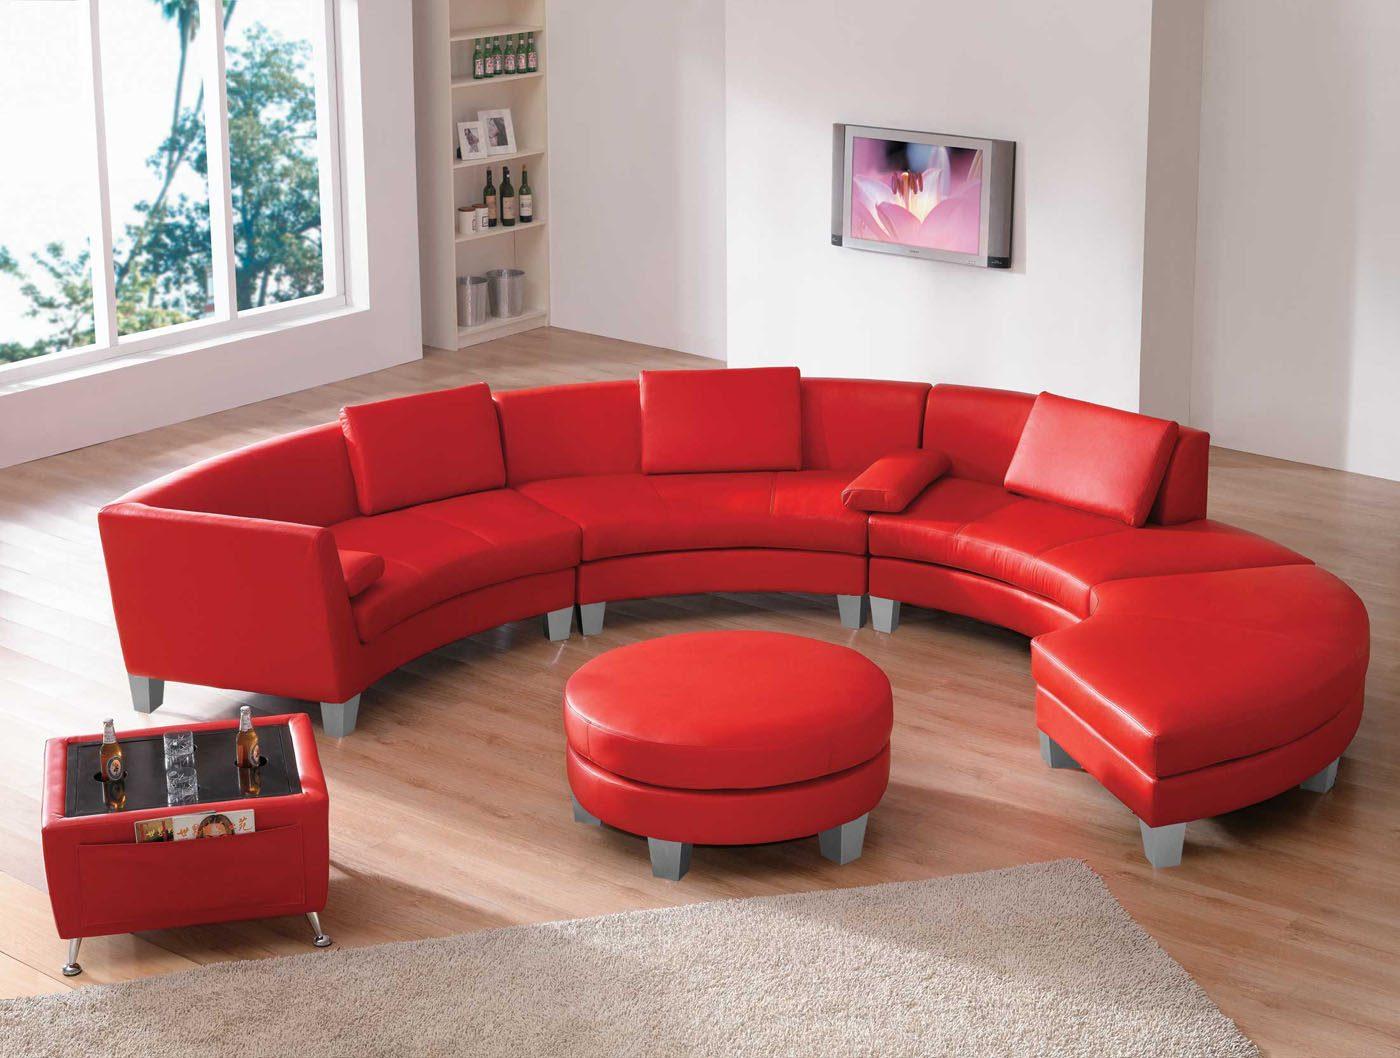 sofa designs in red colour sectional sleeper queen cheap galería de imágenes muebles modernos para el salón